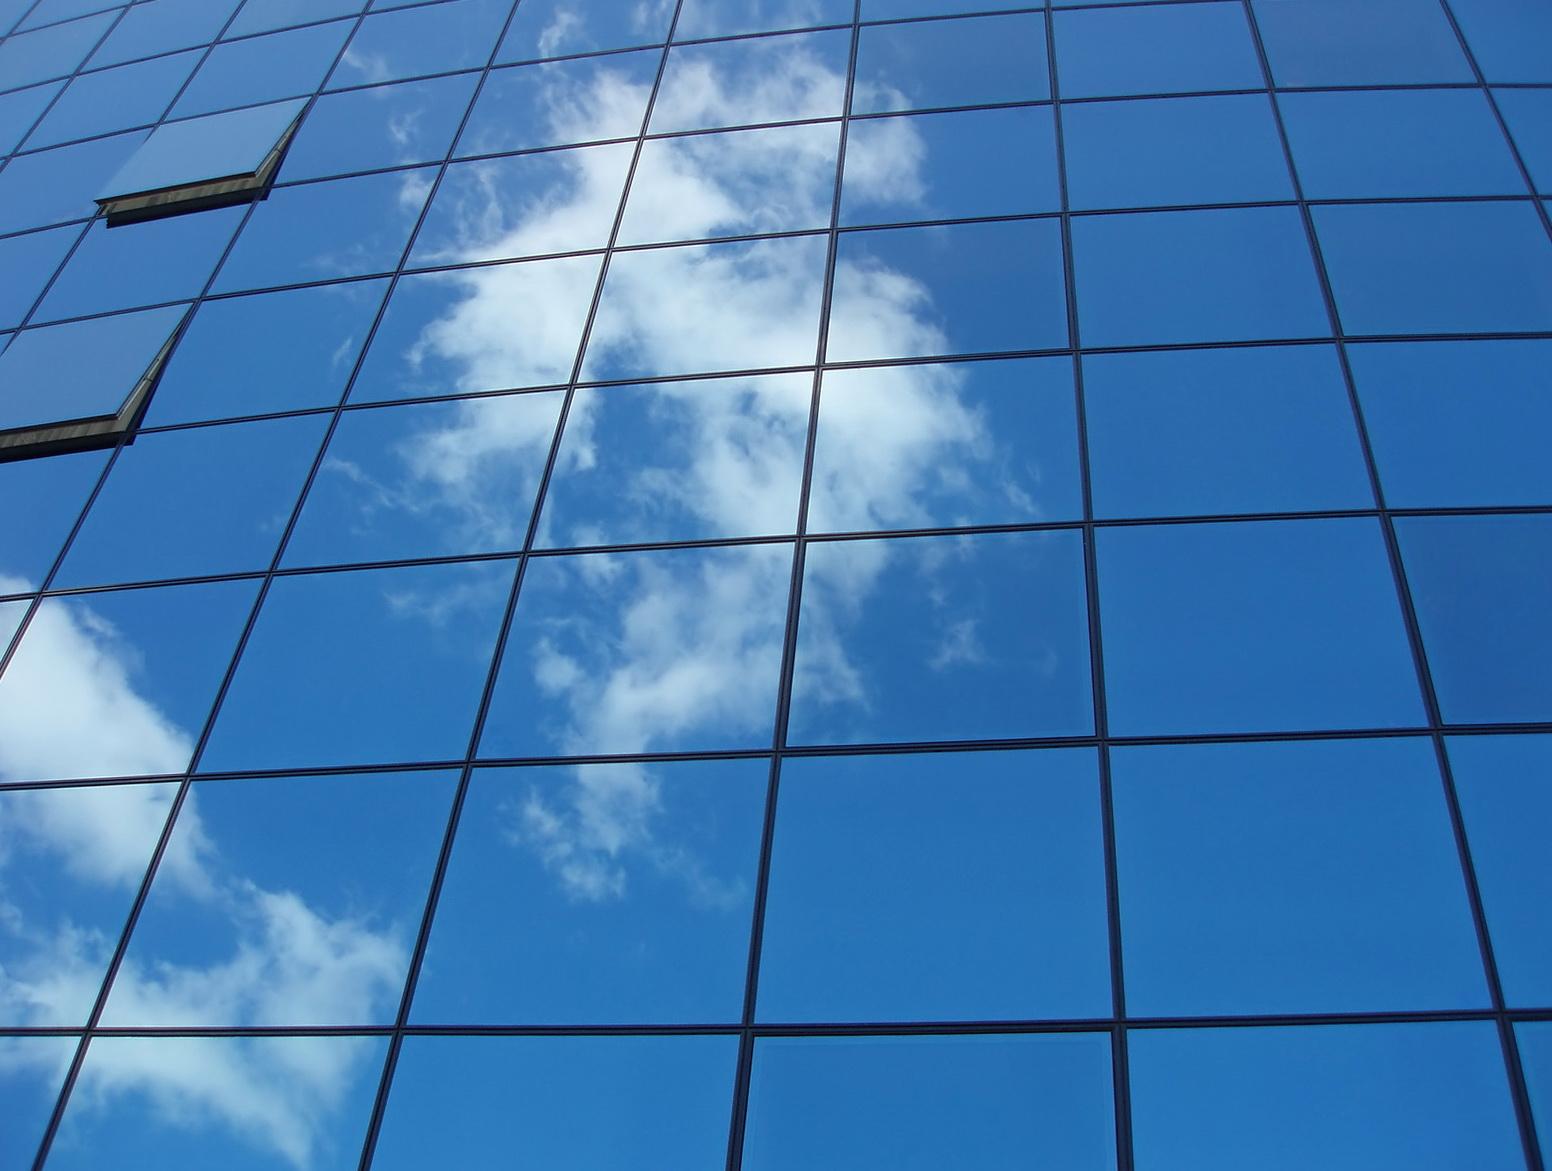 Glass Curtain Wall Texture Home Design Ideas